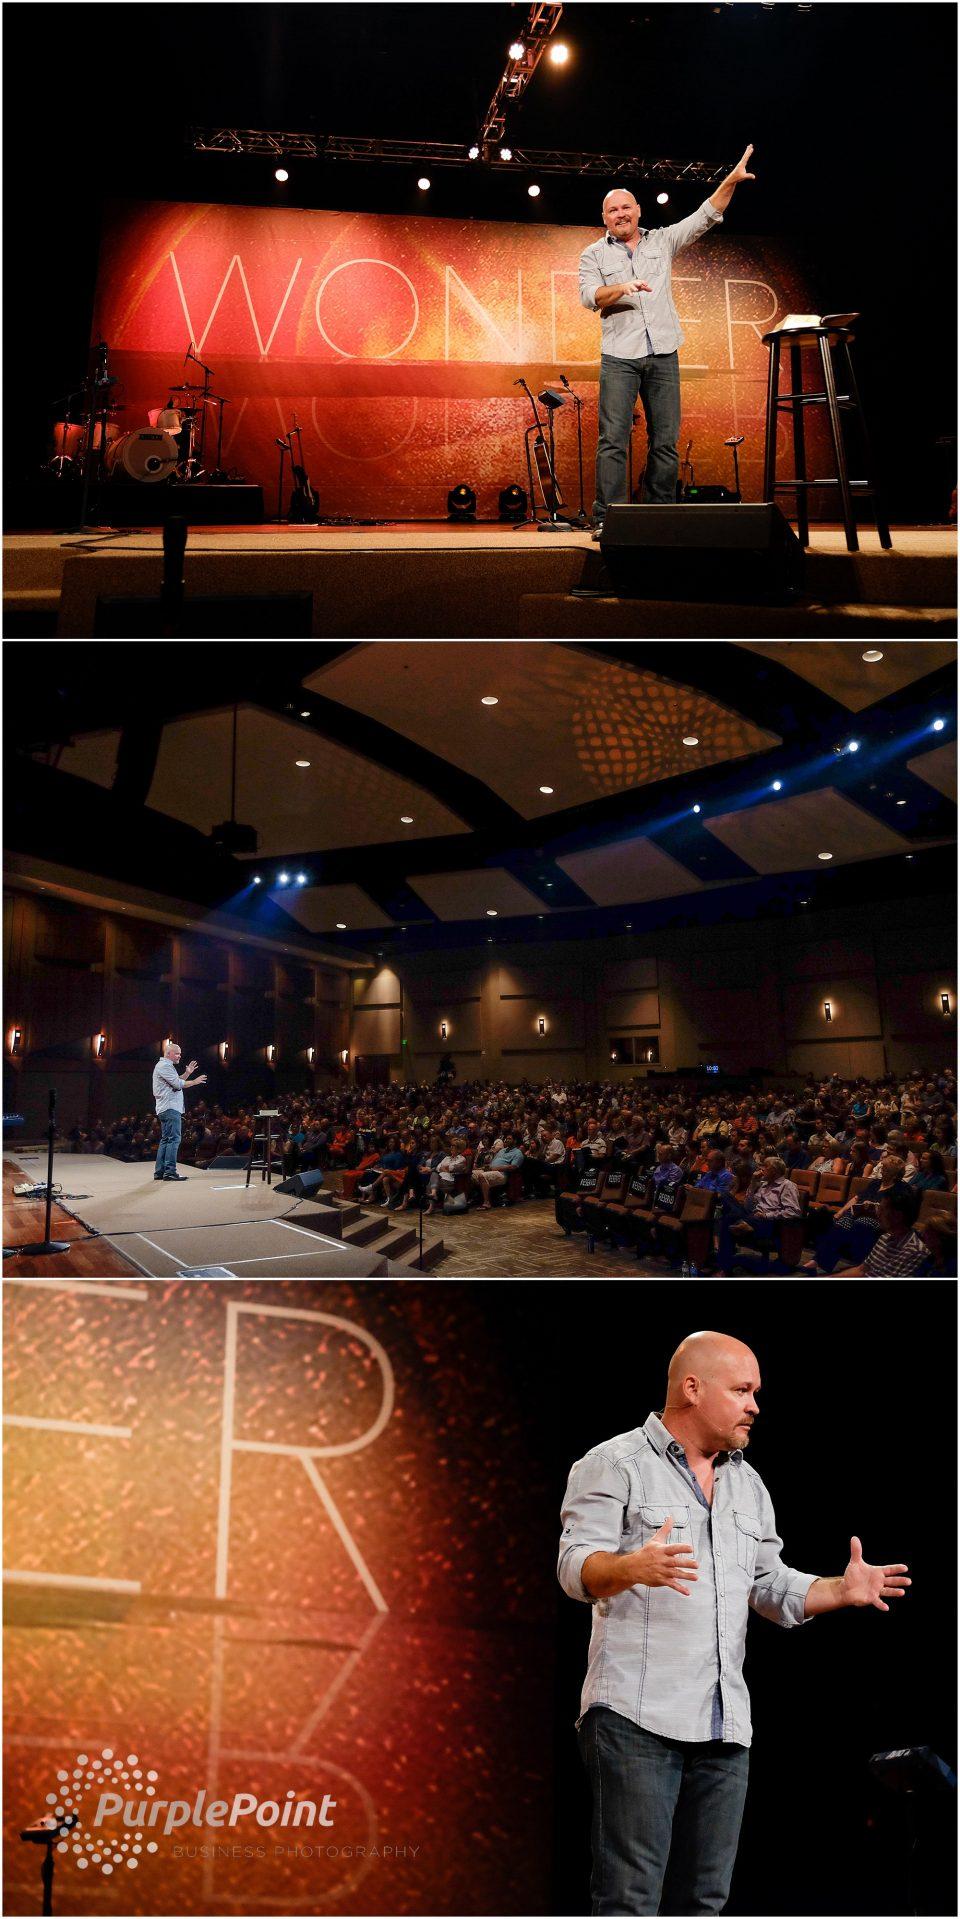 mission_hills_church_event_photos-4